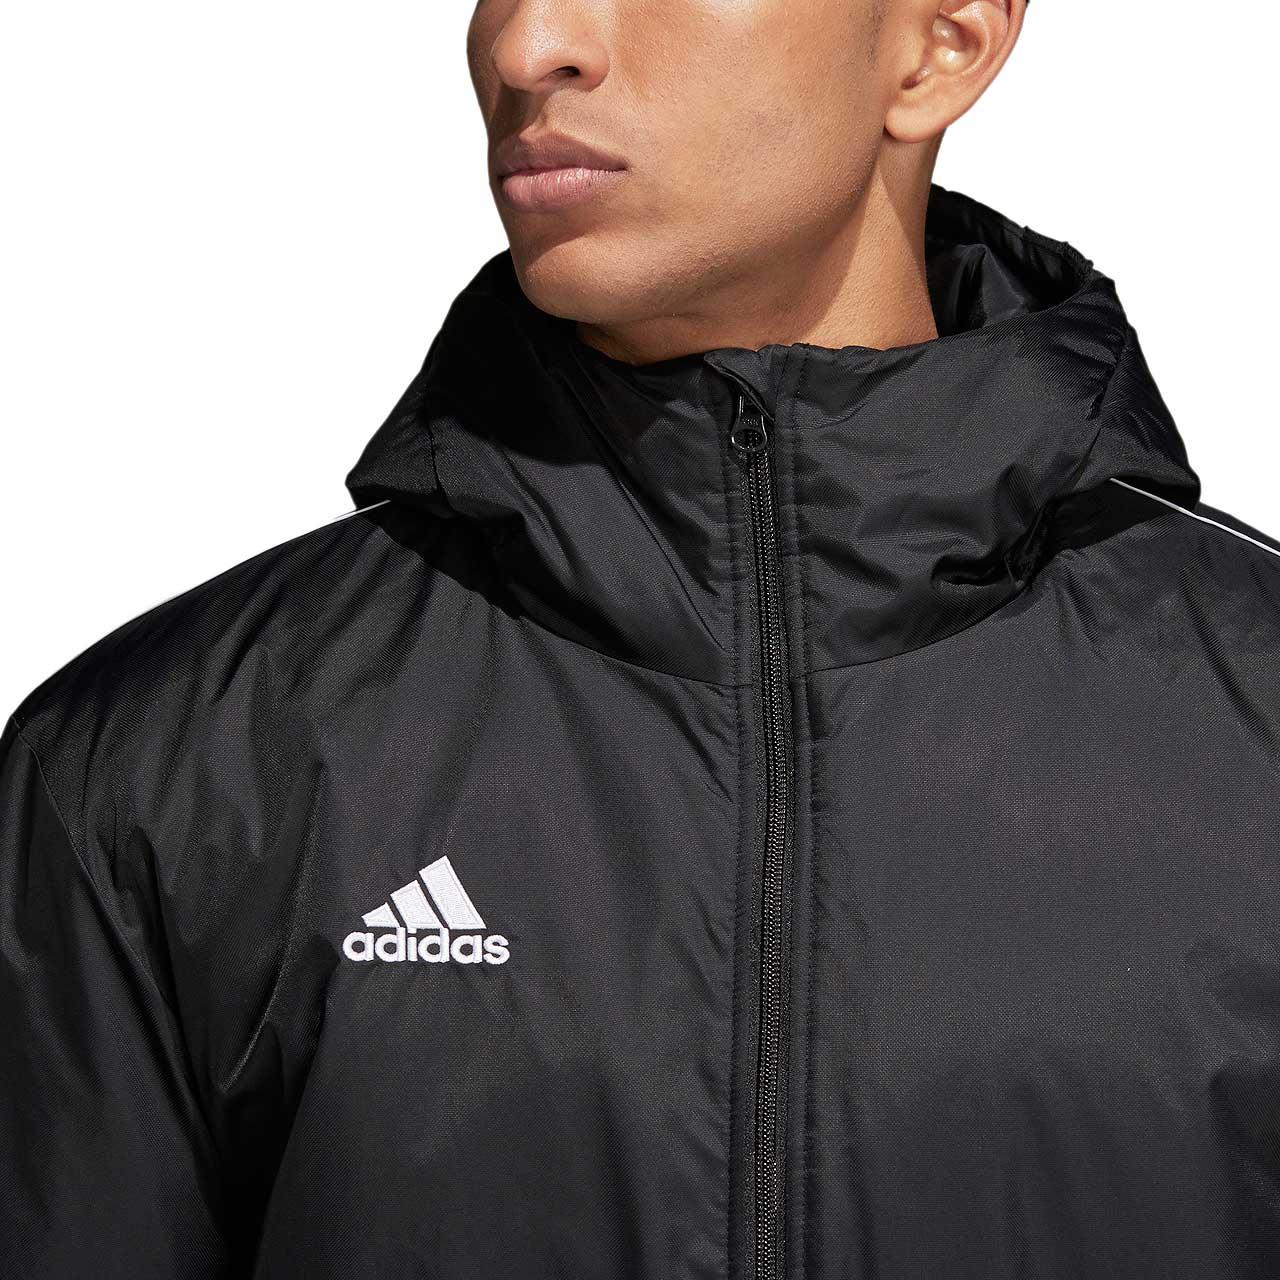 adidas Stadium Jacket Tiro 11 Marine |